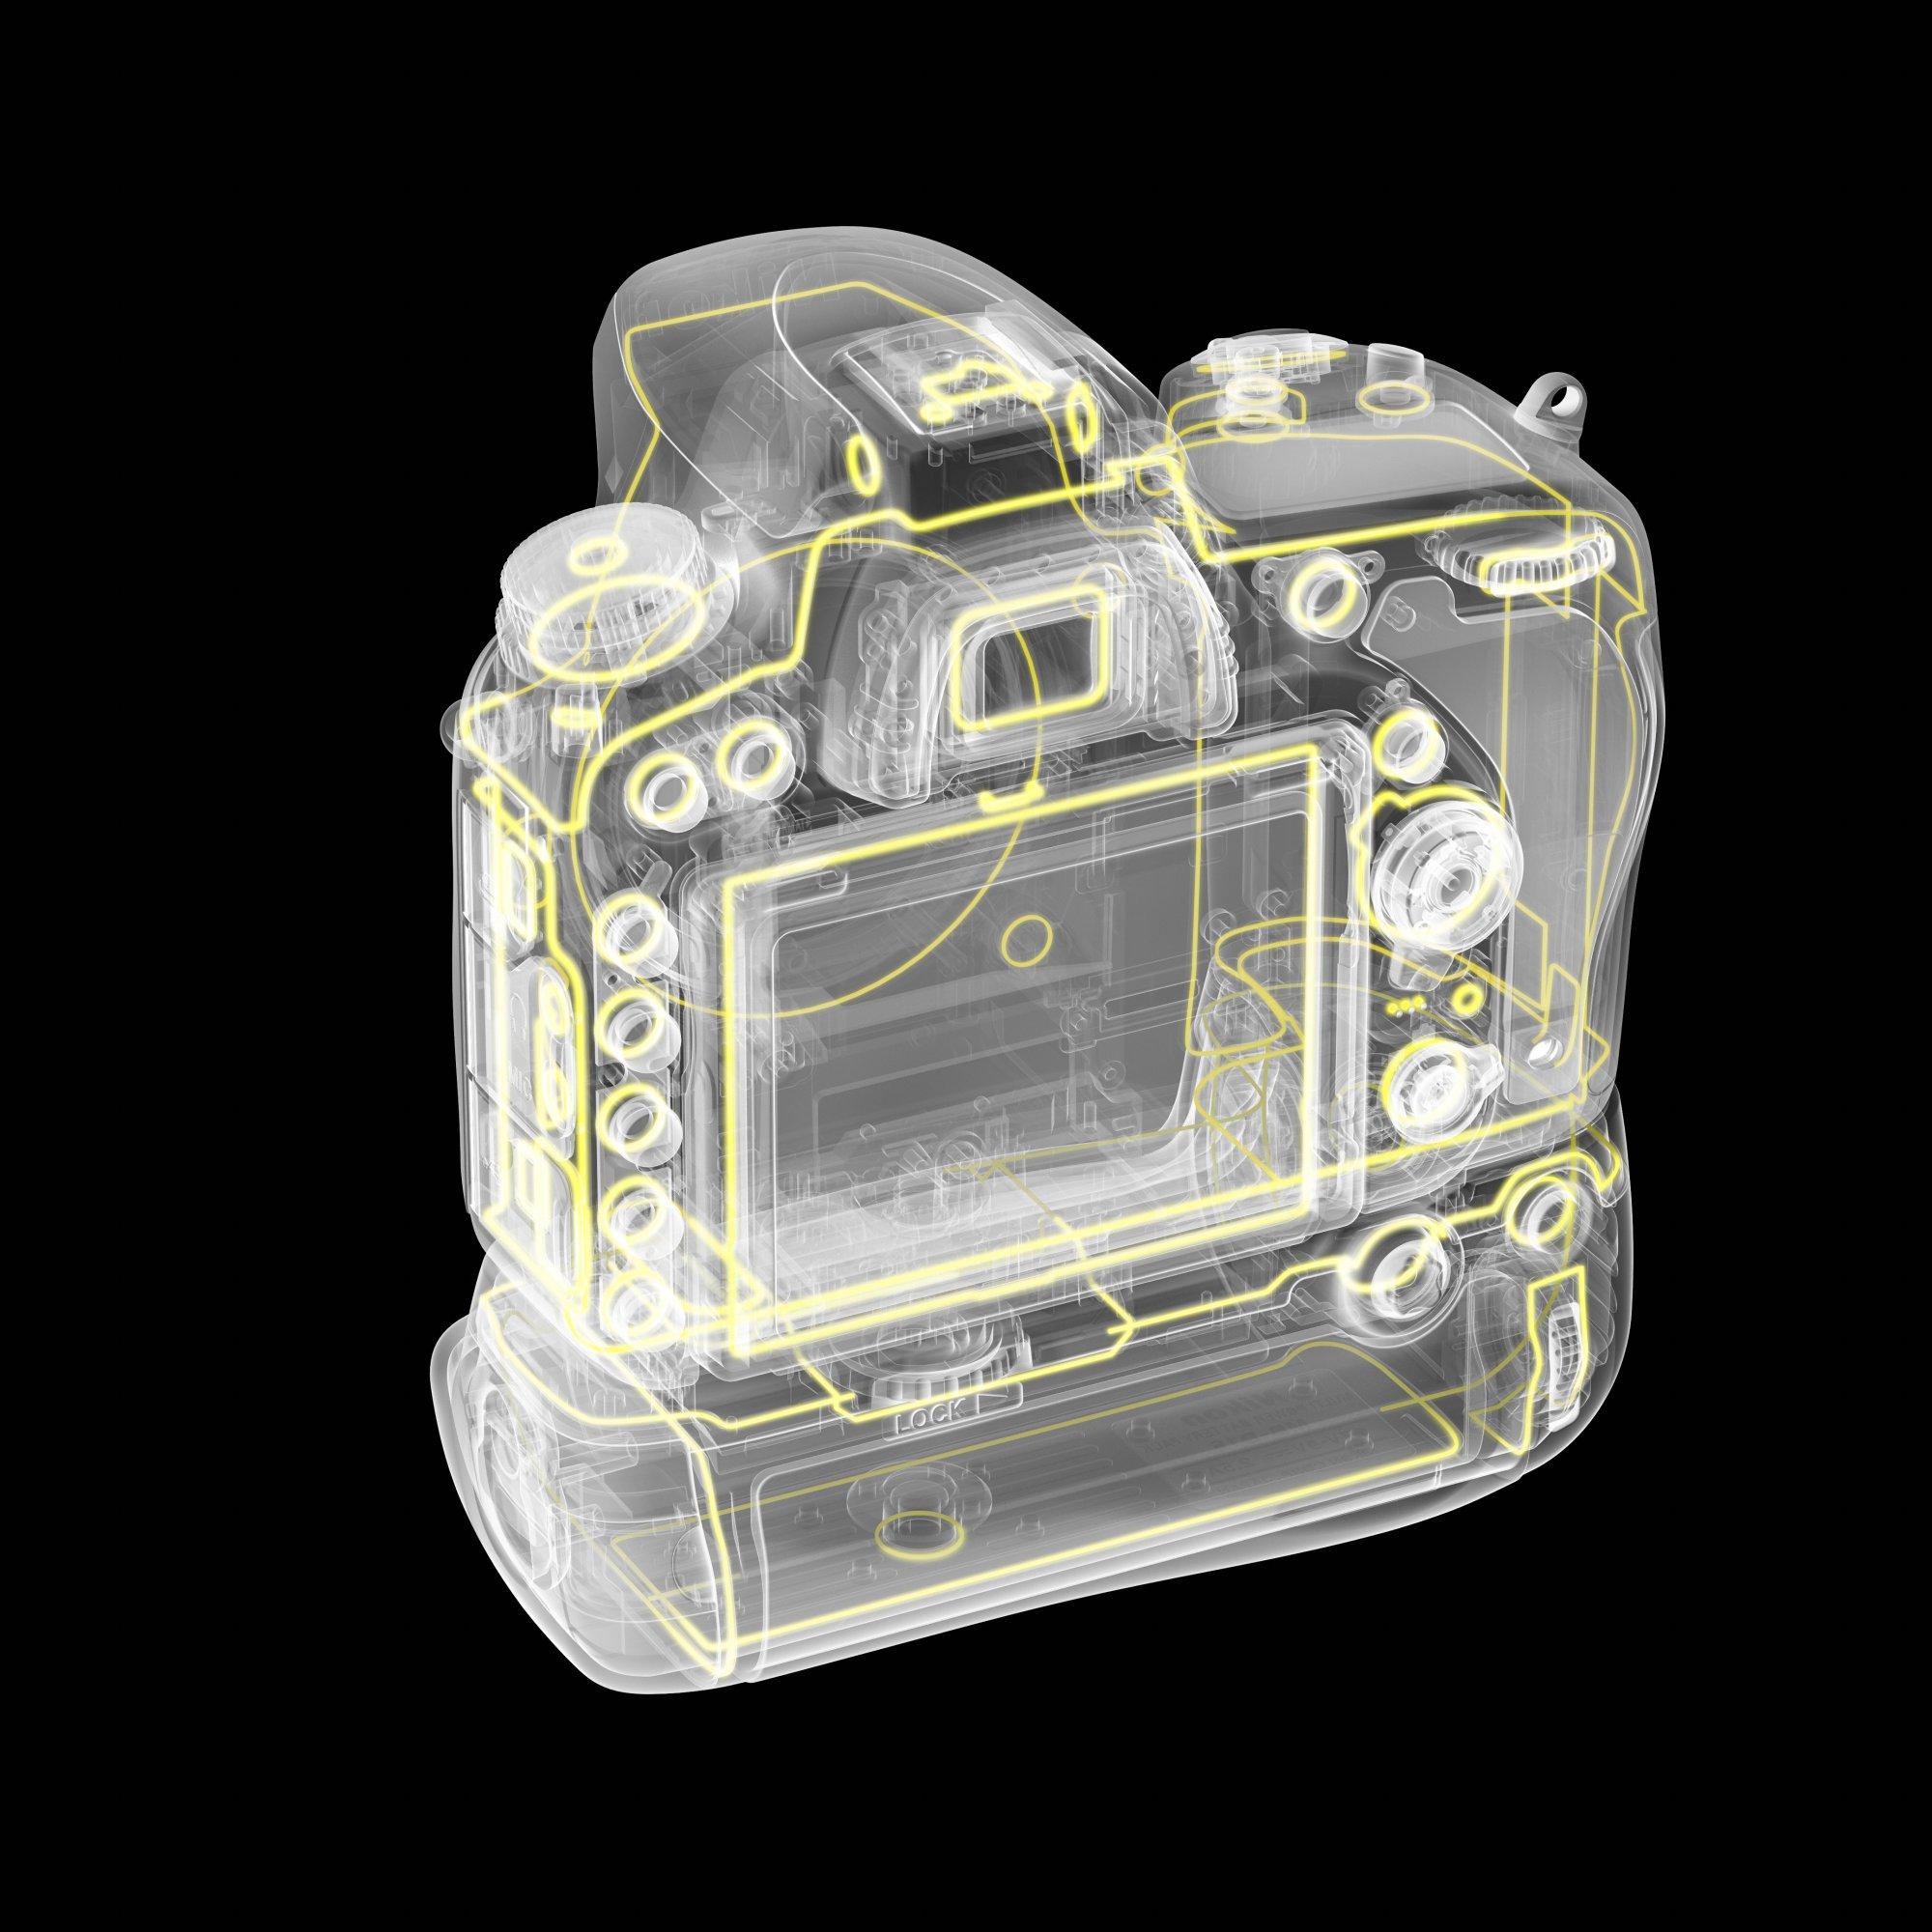 digitale spiegelreflexkamera neue vollformat dslr nikon d750 c 39 t fotografie. Black Bedroom Furniture Sets. Home Design Ideas